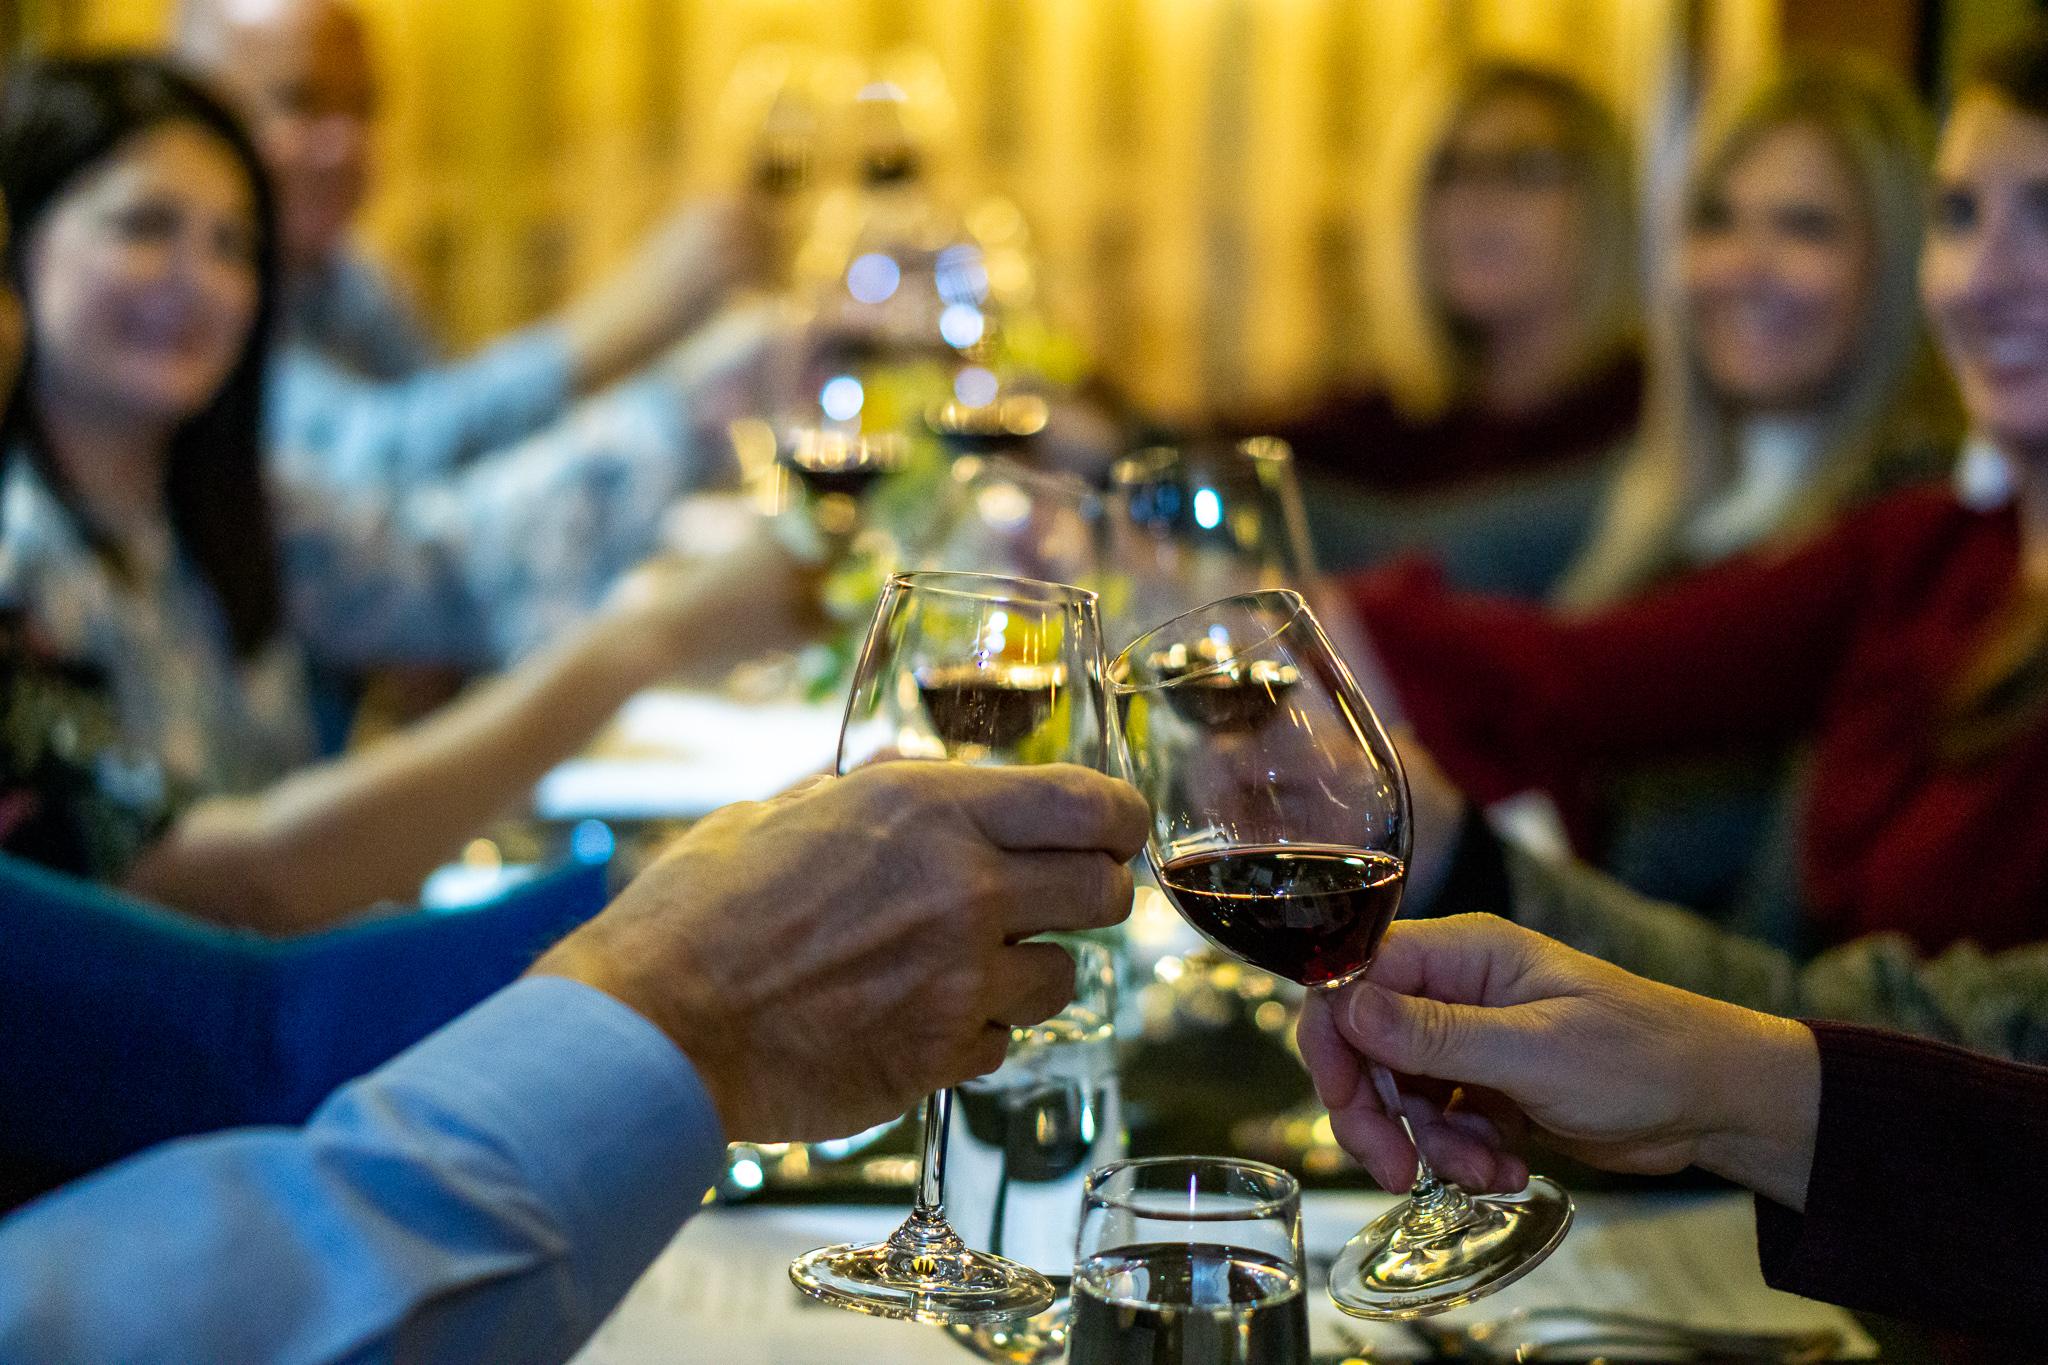 wine-maestro-the-sassy-gourmet-wine49.jpg